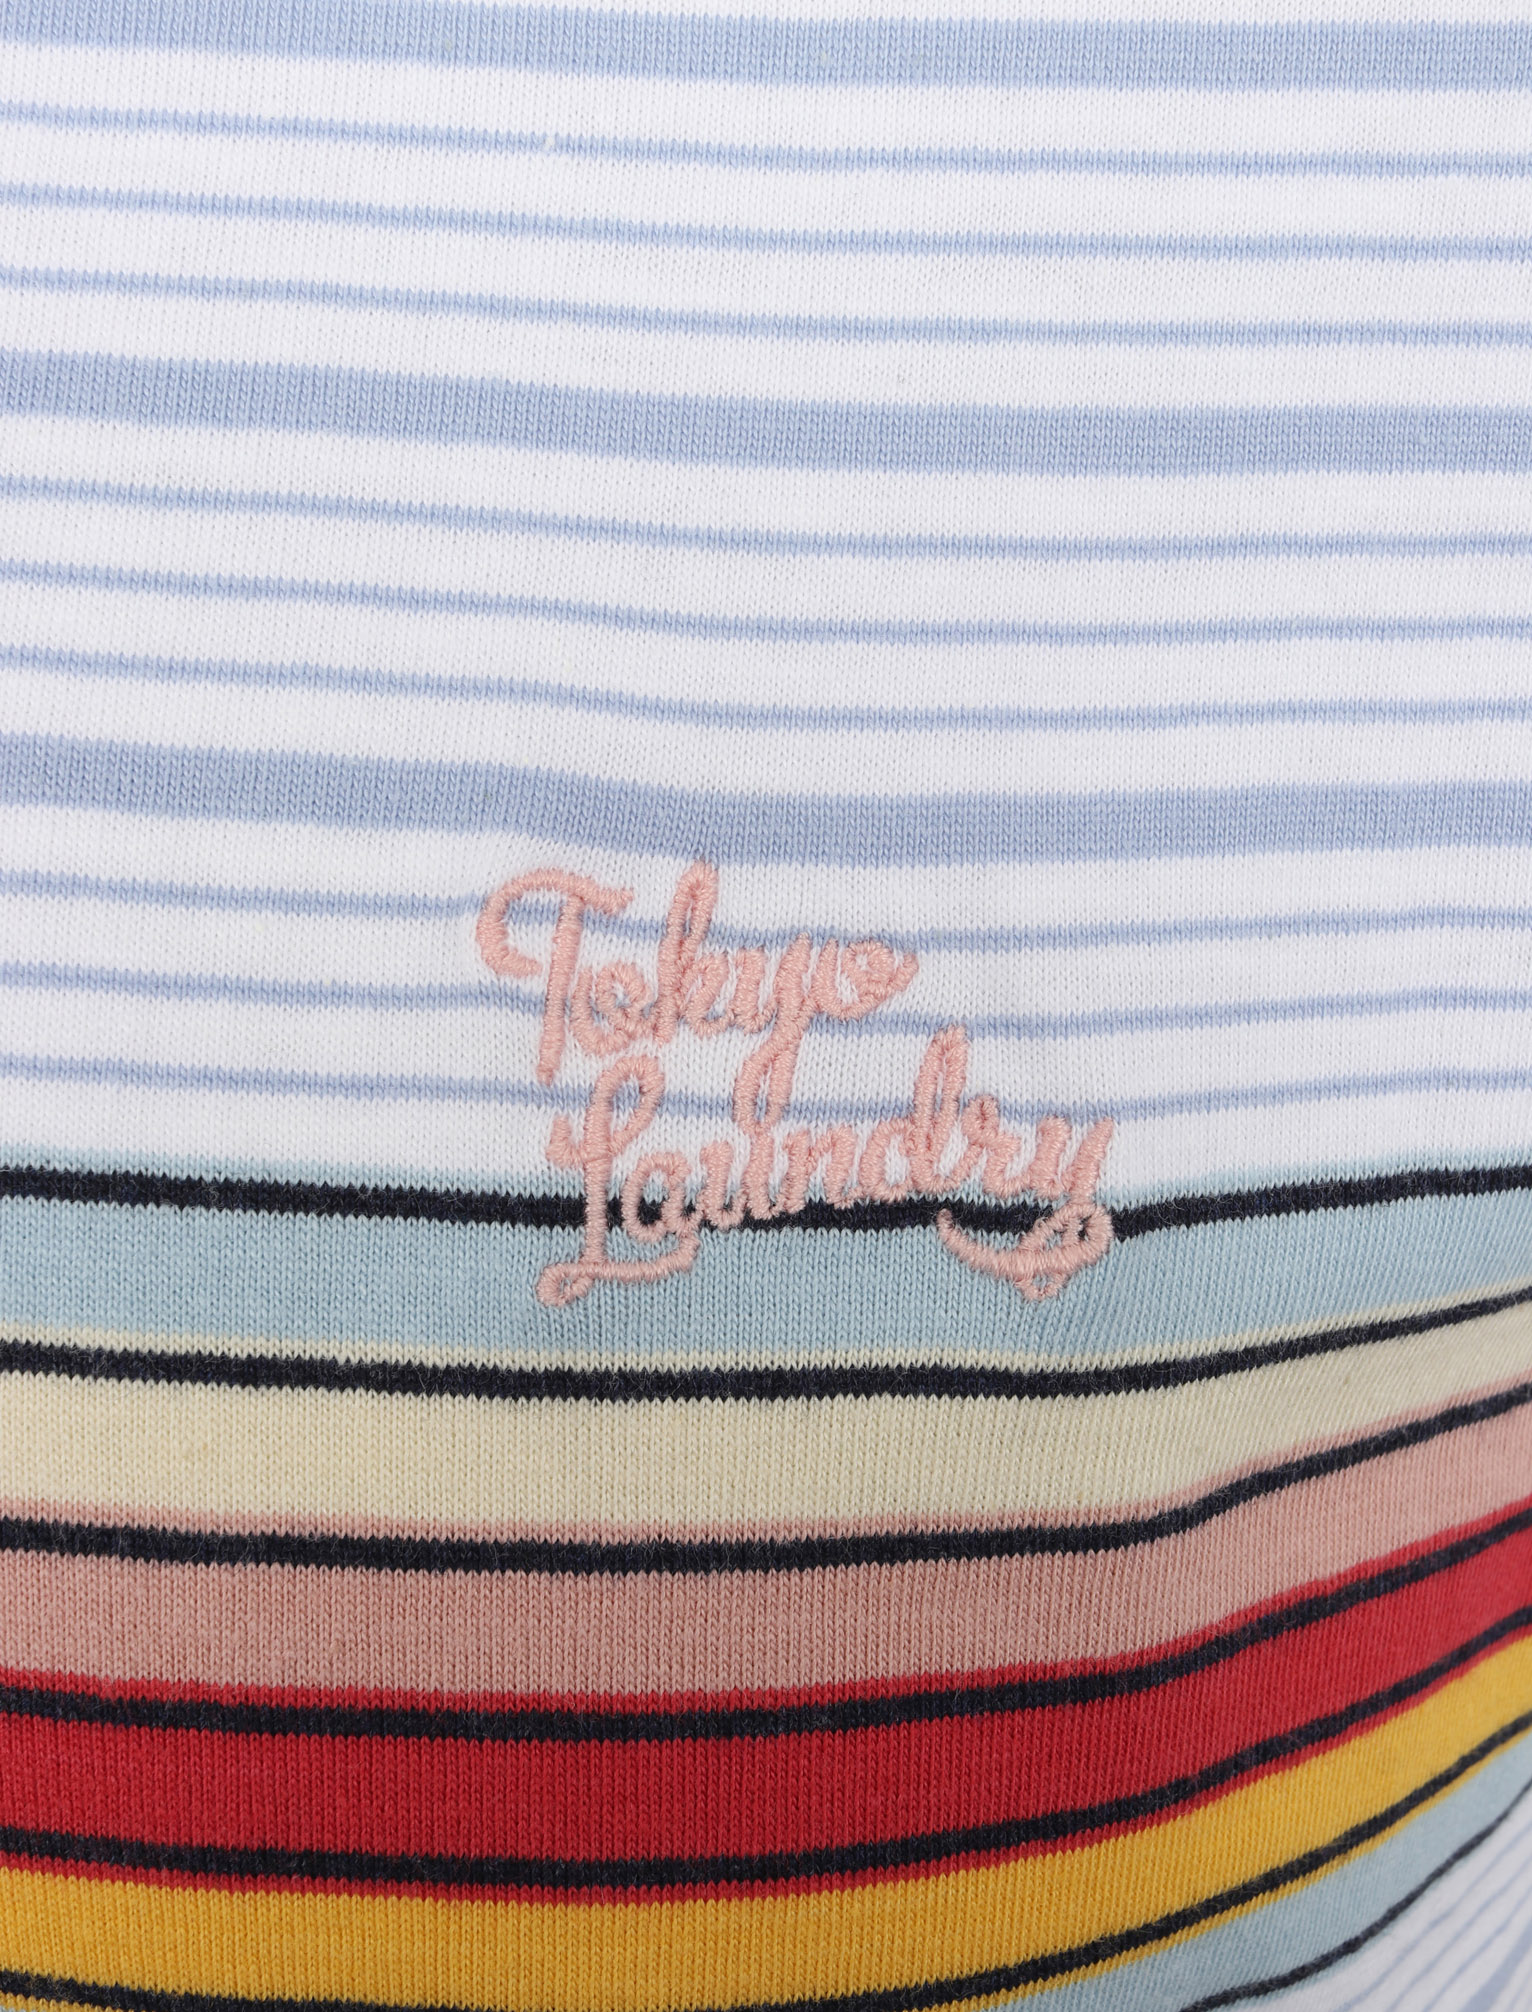 Tokyo-Laundry-Men-039-s-Bakersfield-Striped-Polo-Shirt-Stripy-Retro-Vintage-T-Shirt thumbnail 12